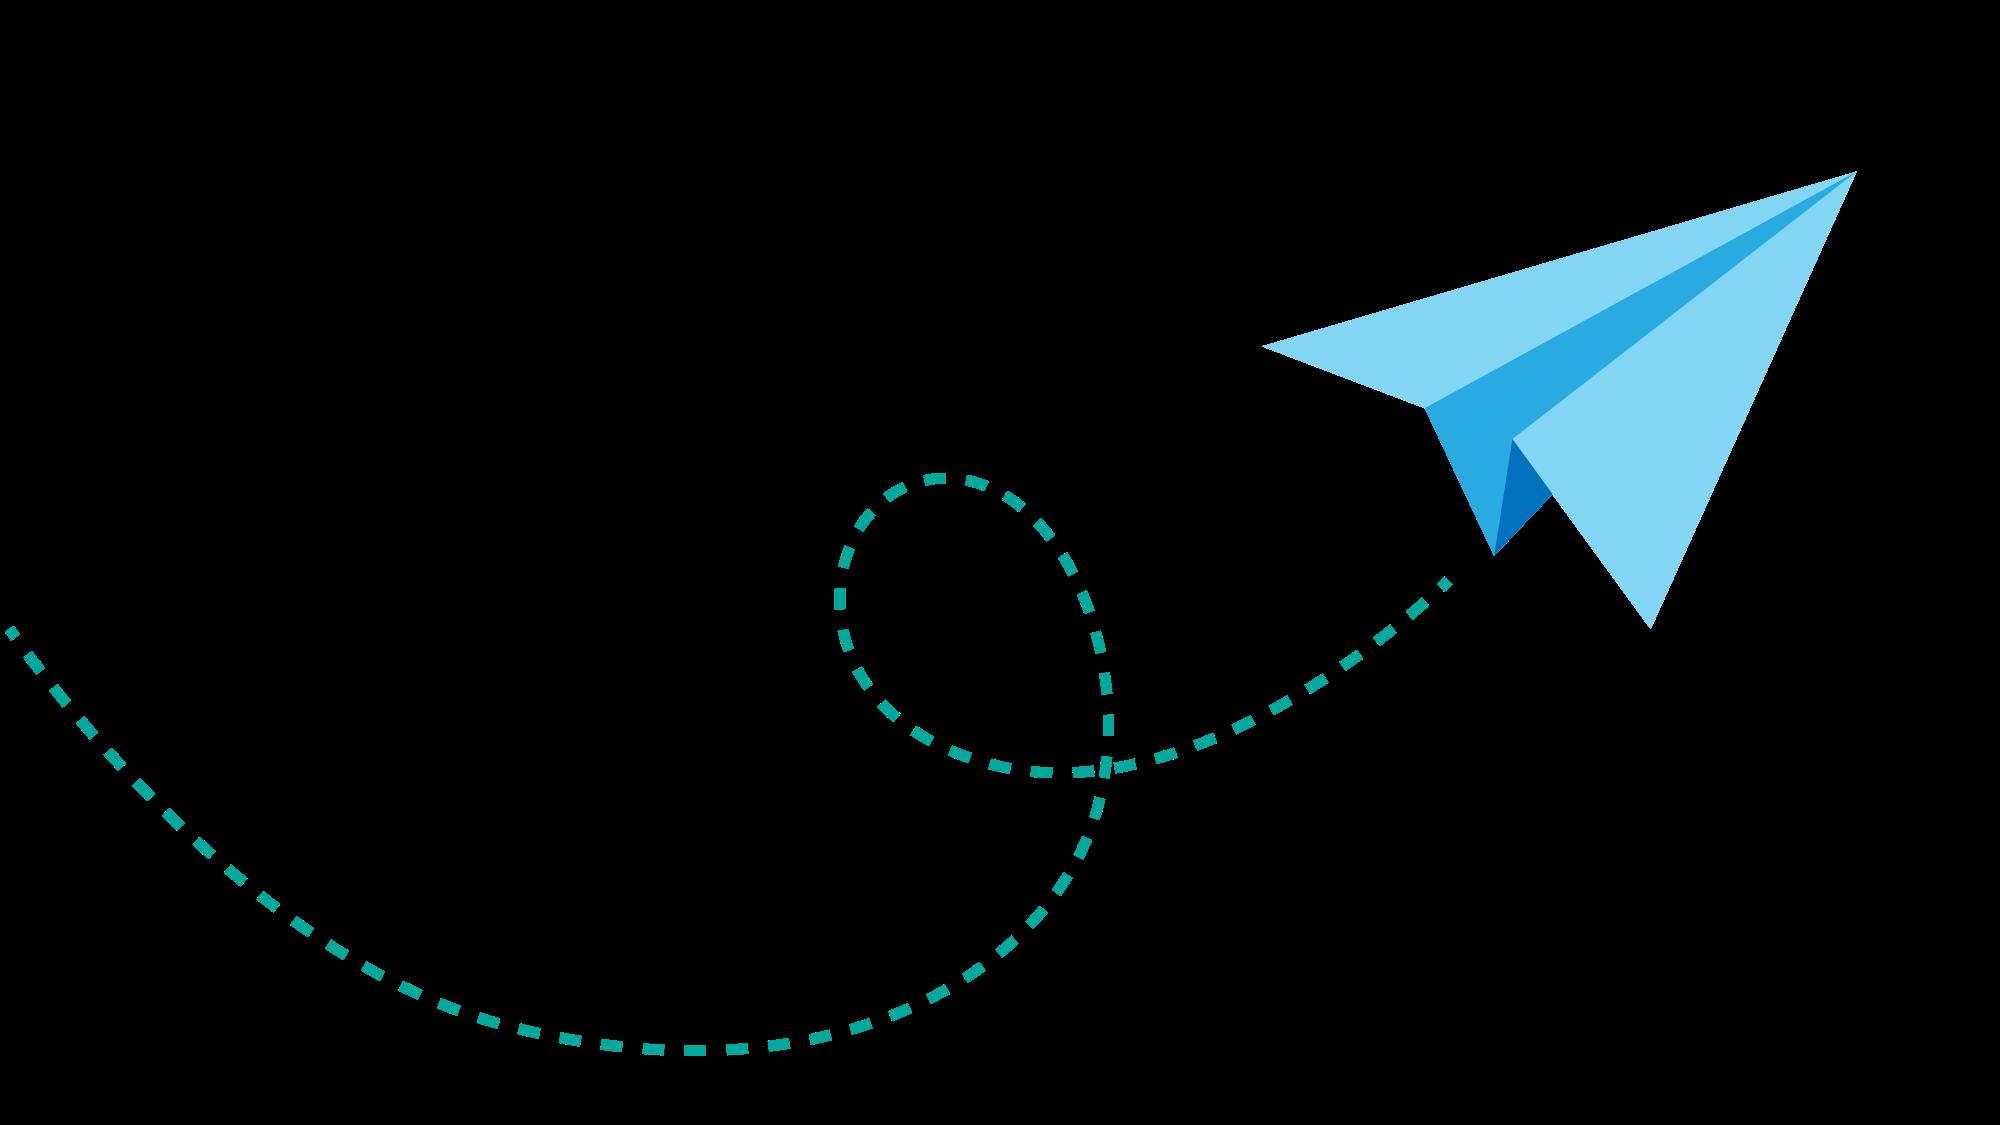 2000x1125 Filepaper Plane Vector.svg